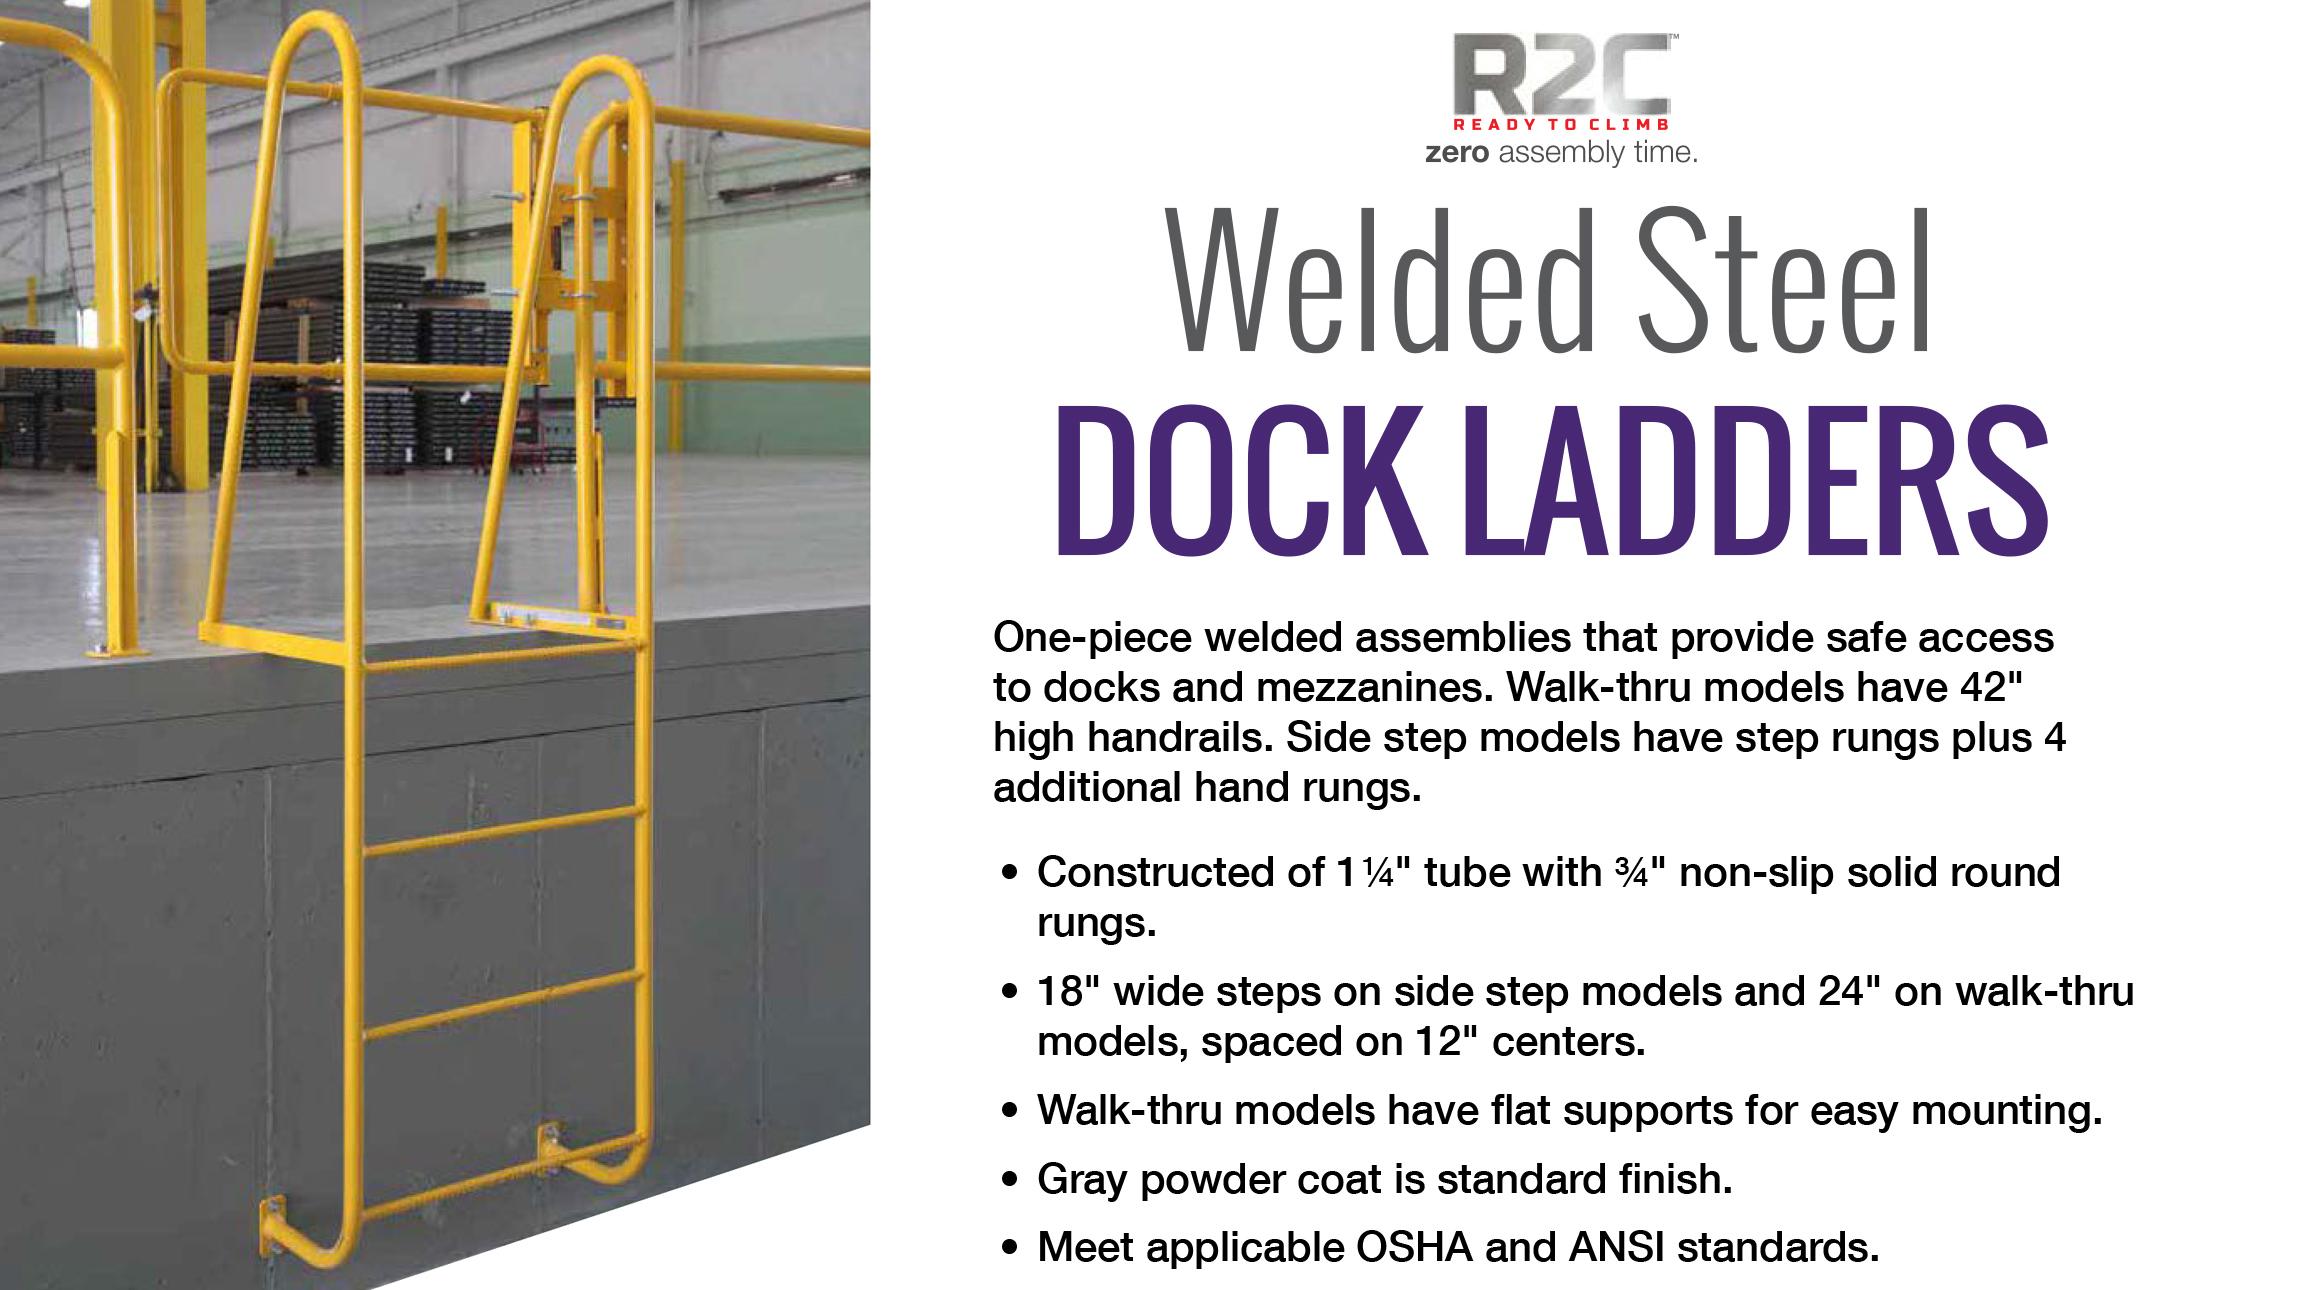 cotterman-dock-ladder-category.jpg